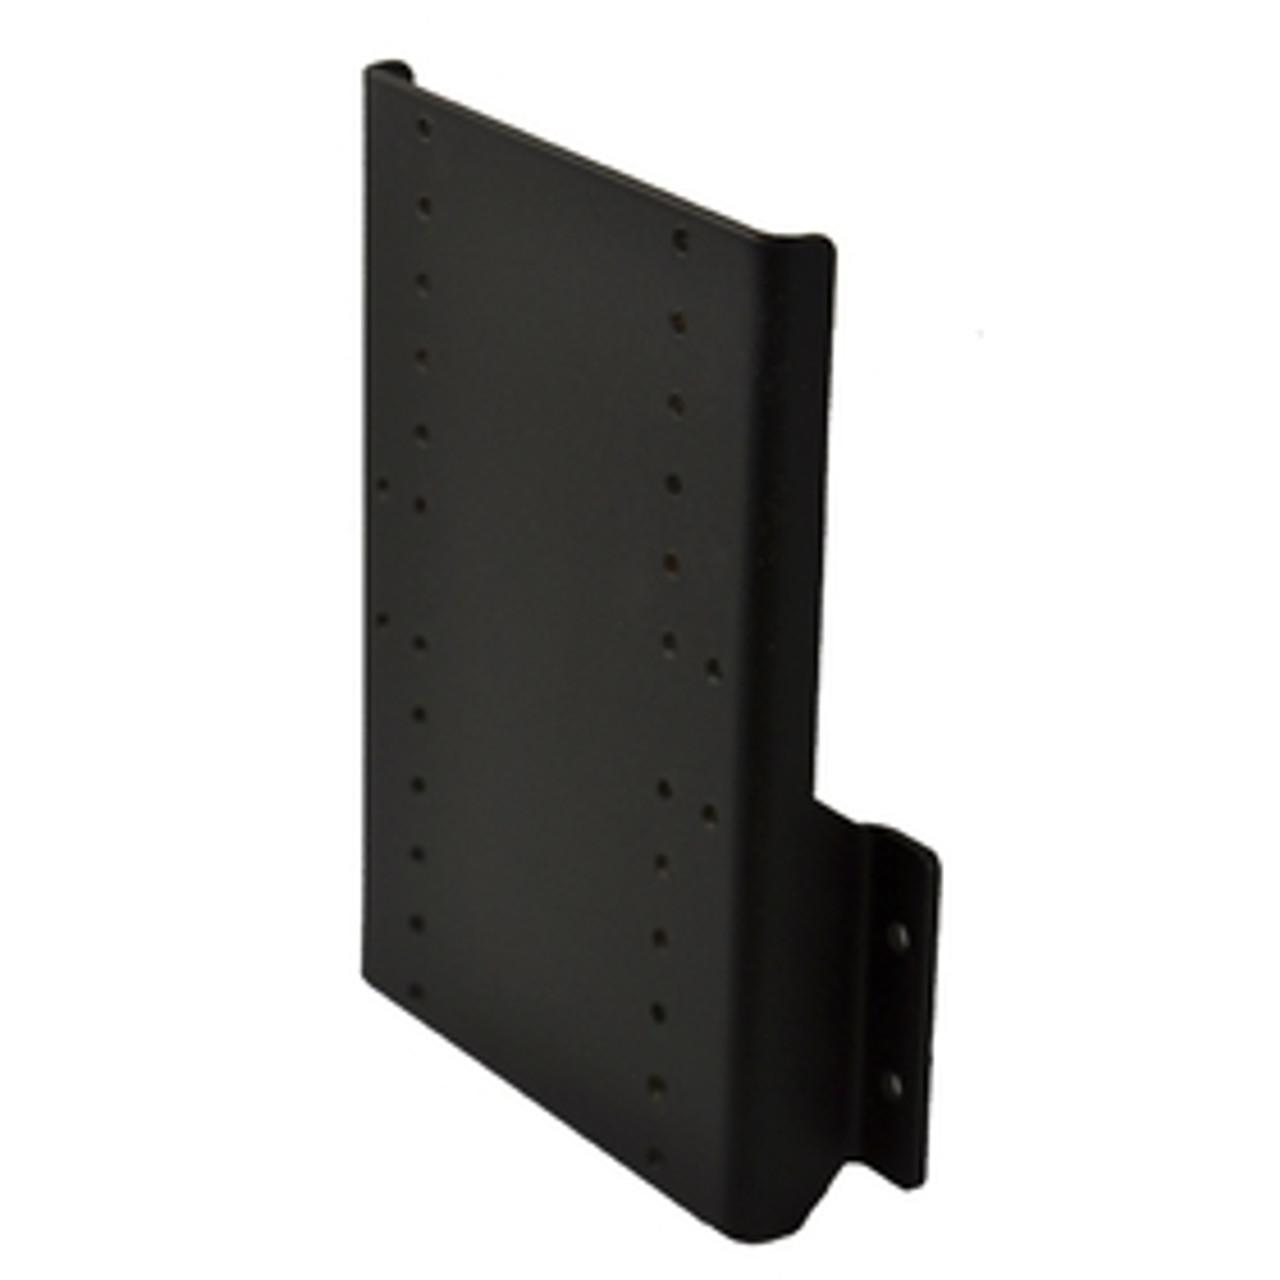 IBM 4820 Monitor POS Adapter Bracket